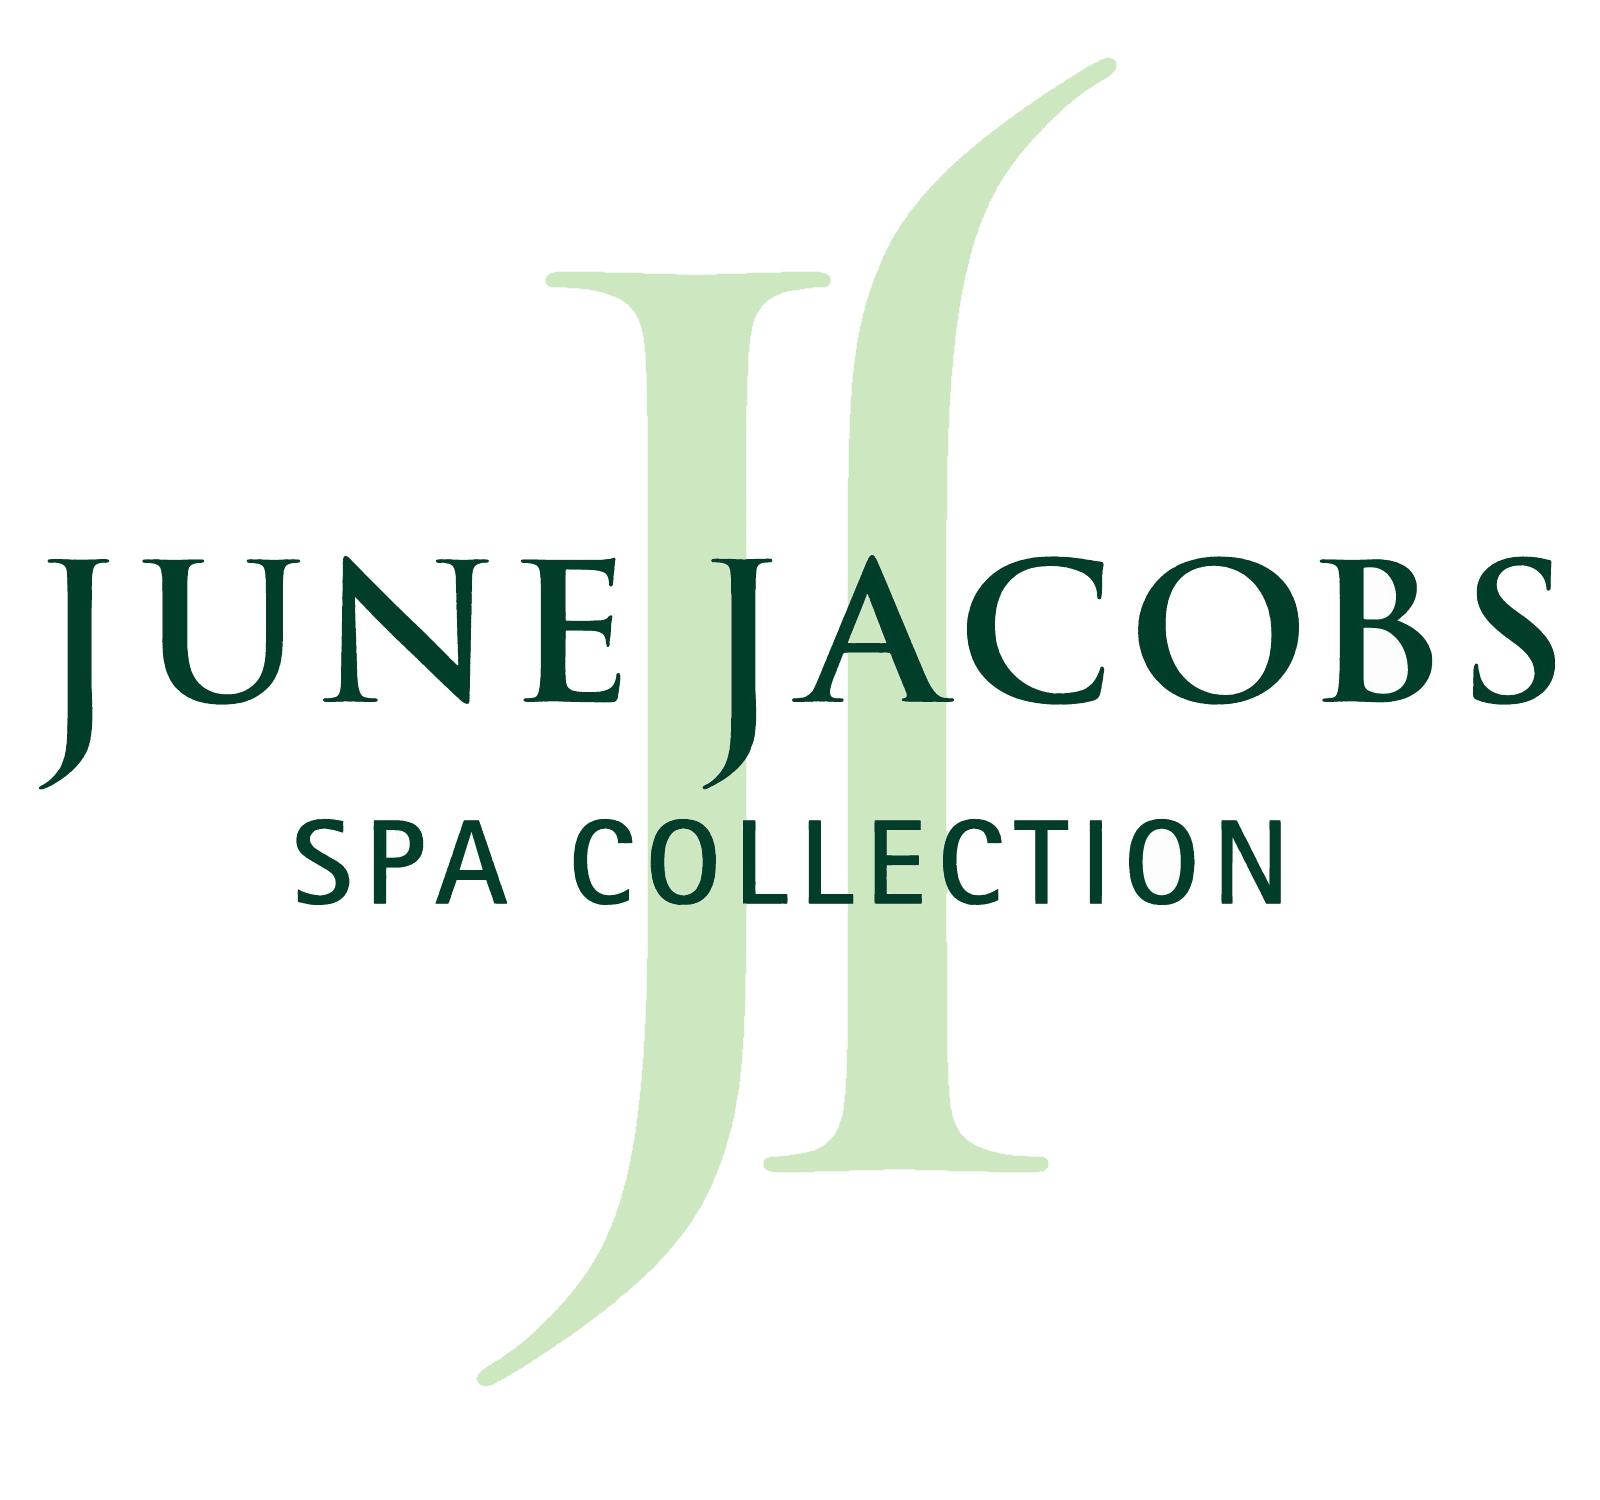 June Jacobs's logo